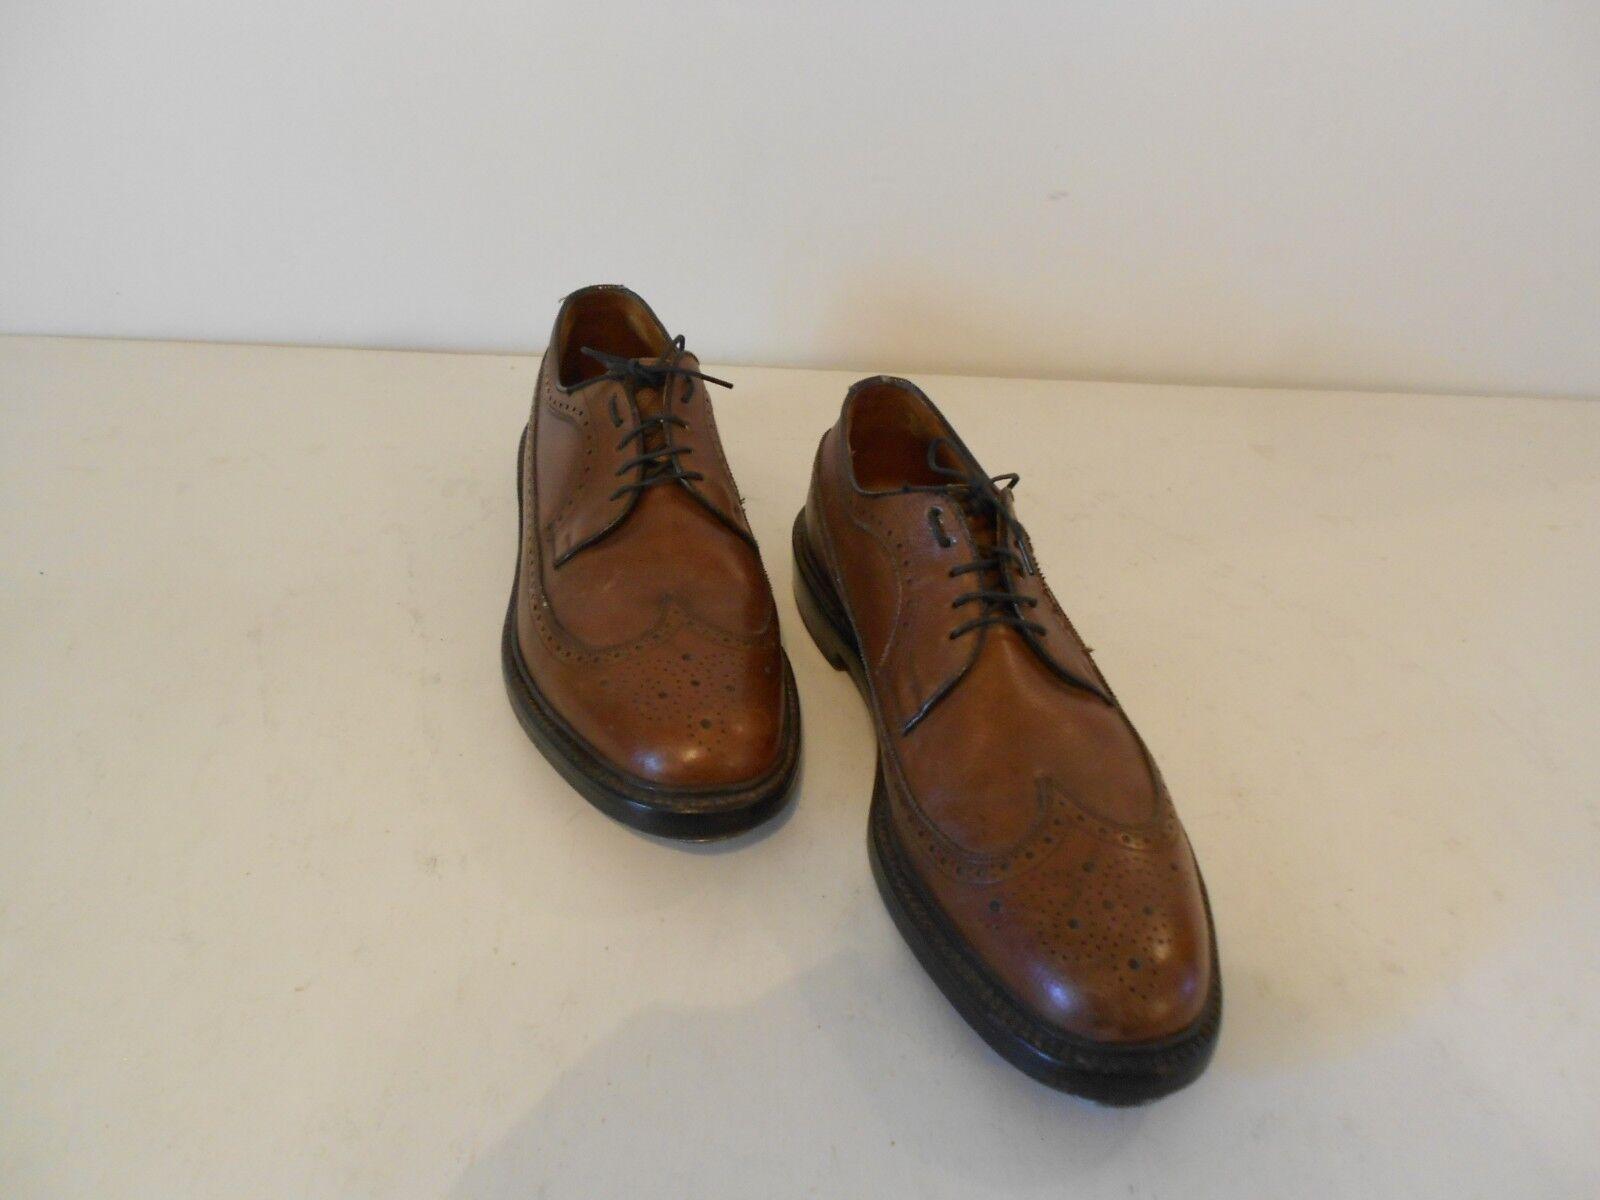 il più recente Uomo Foot Joy Wing Tip scarpe Caramel Marrone Leather Leather Leather Heel Cleat & Toe Guard 9.5 B  migliore offerta